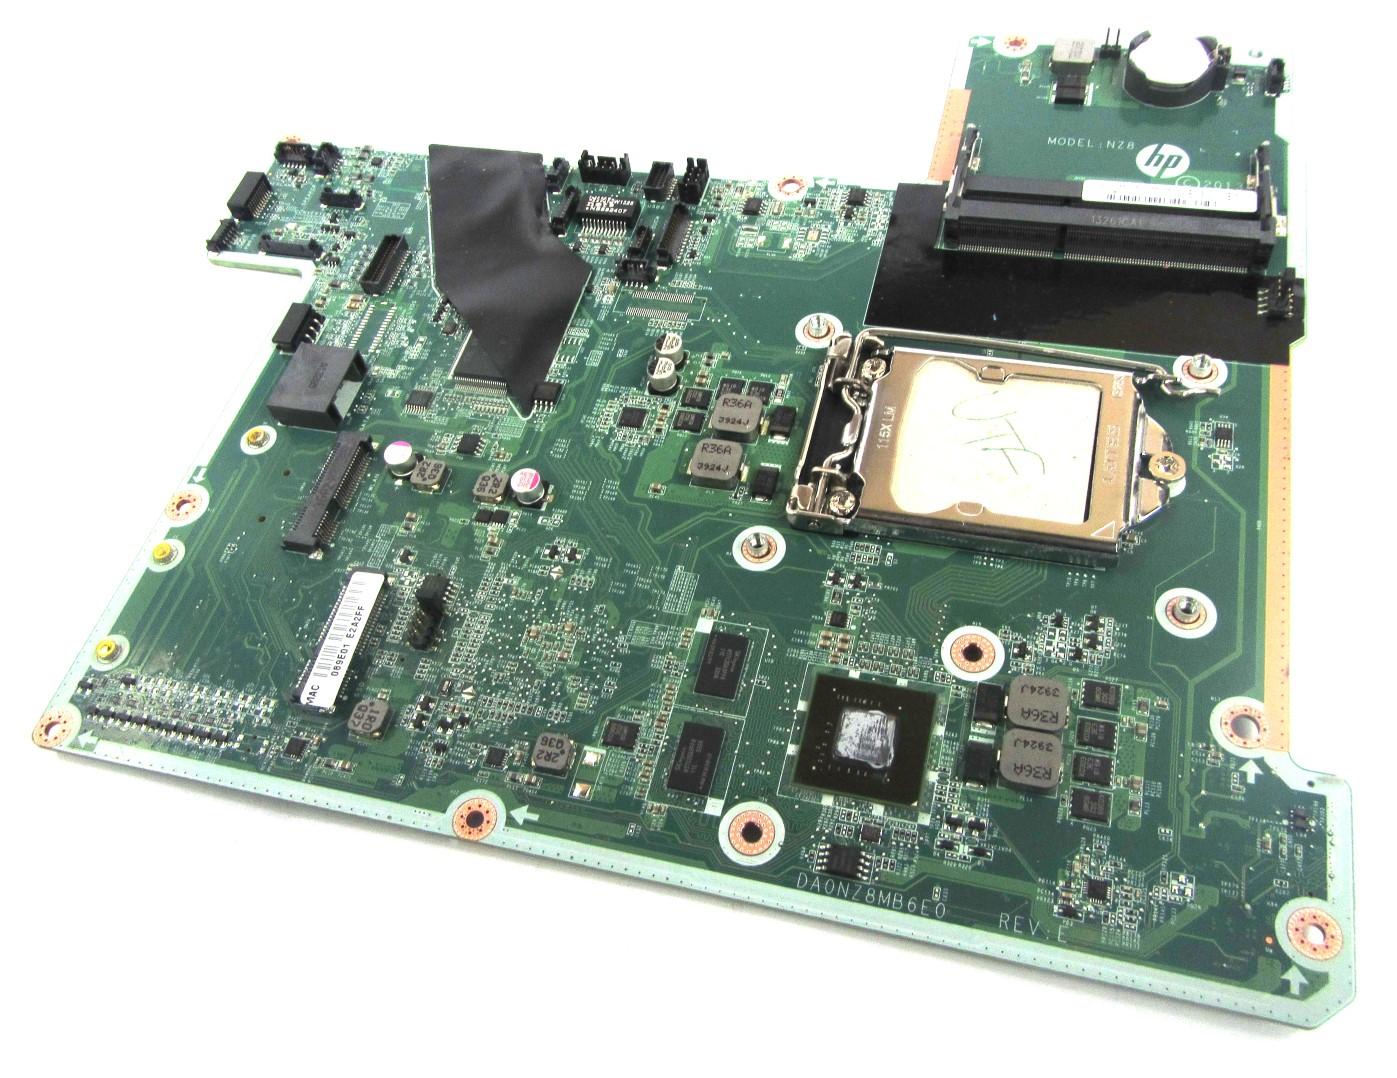 712644-001 HP LGA1150 (Haswell) Motherboard Model: NZ8